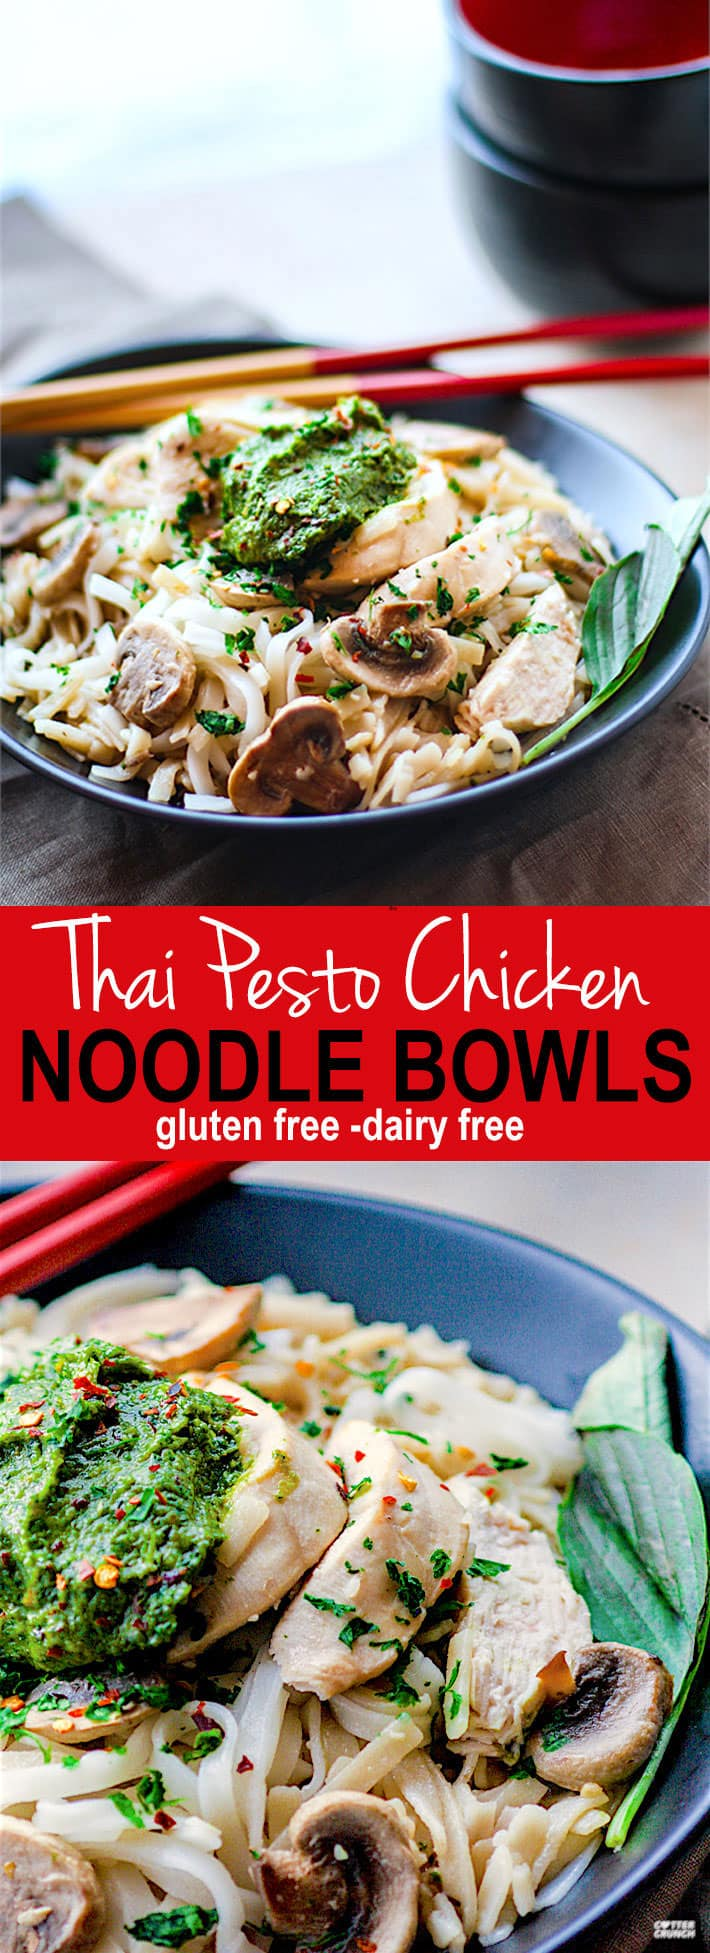 Gluten Free Egg Noodles Whole Foods